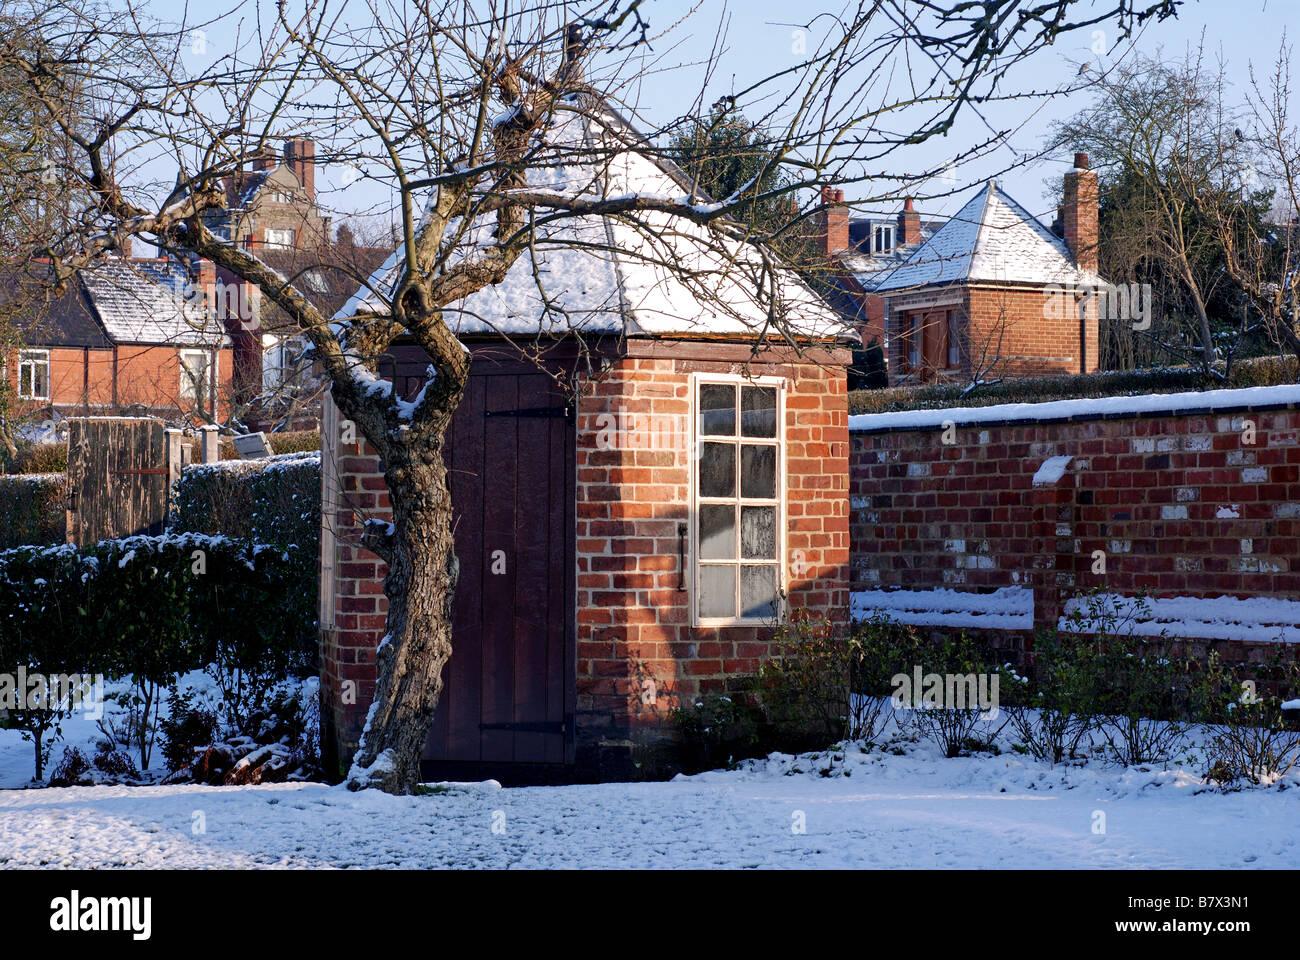 Hill Close Gardens in winter, Warwick, Warwickshire, England, UK - Stock Image